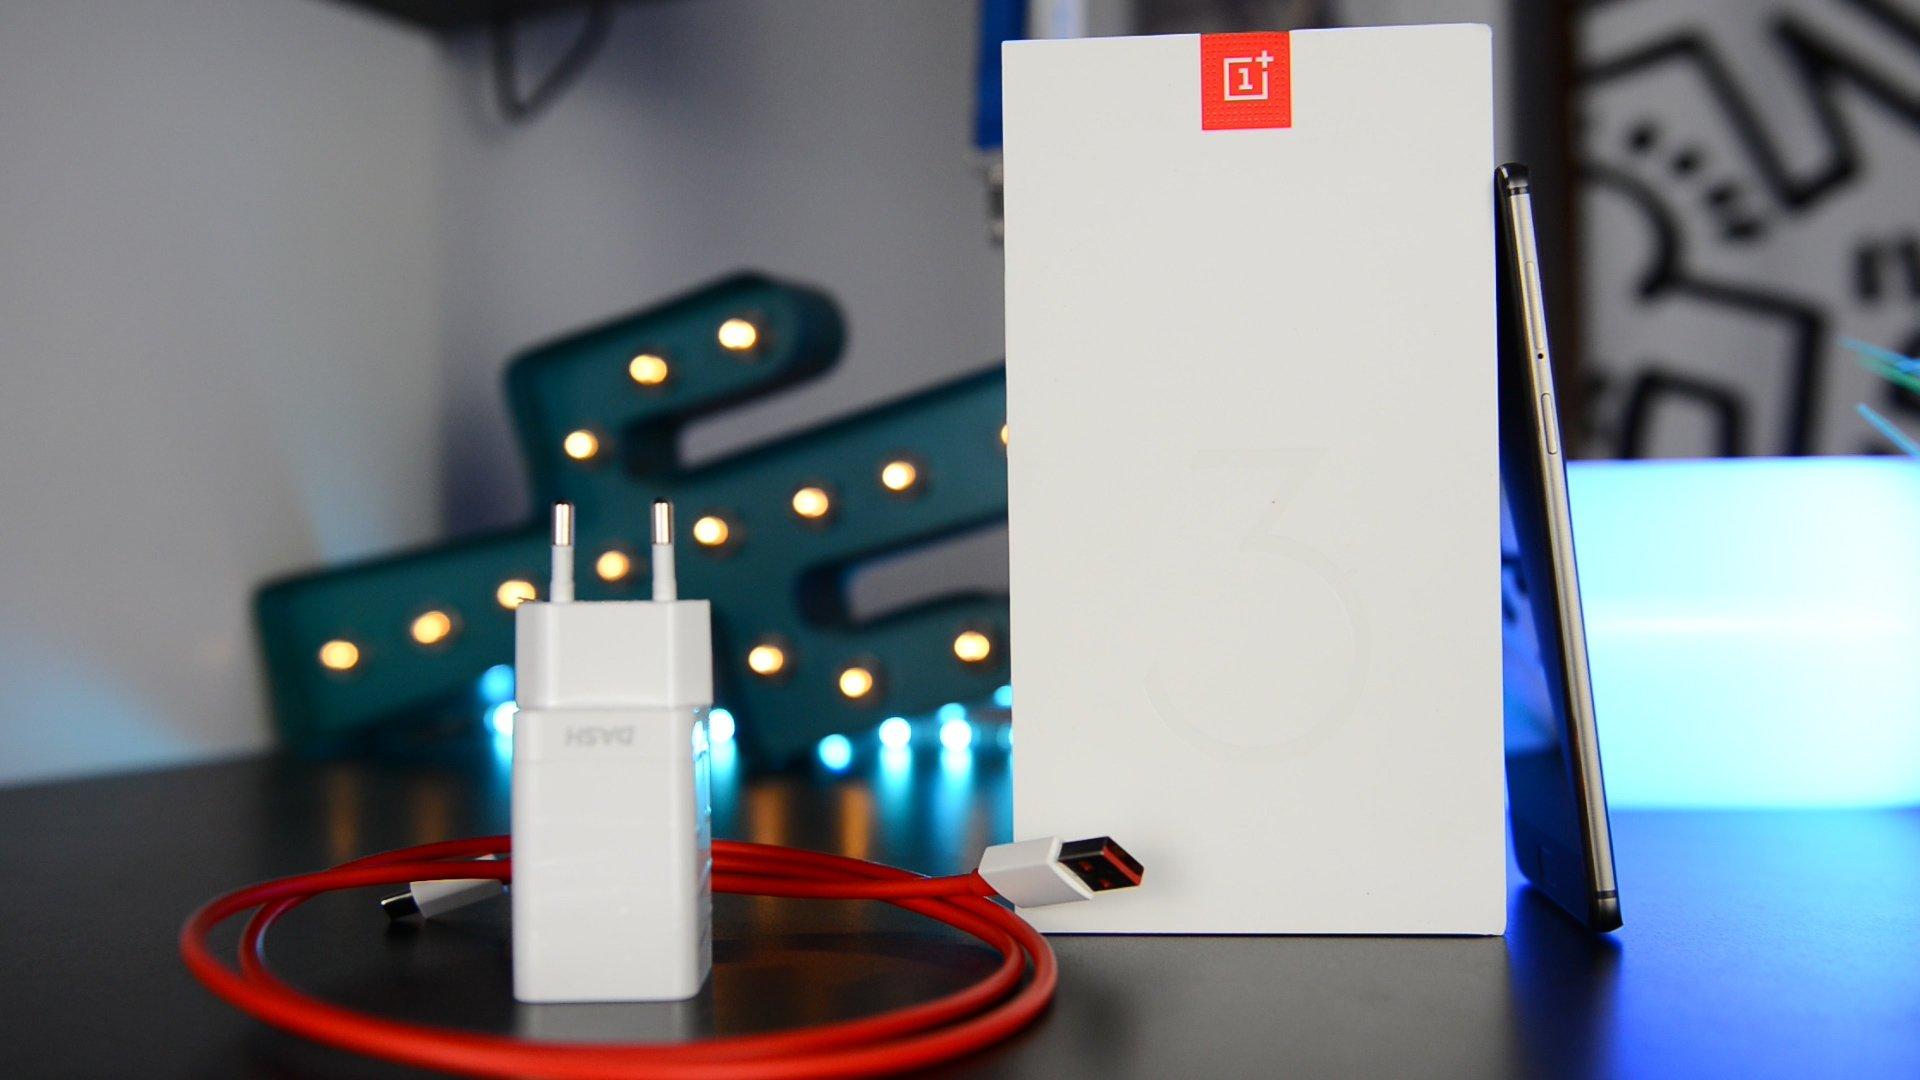 OnePlus-3t-2